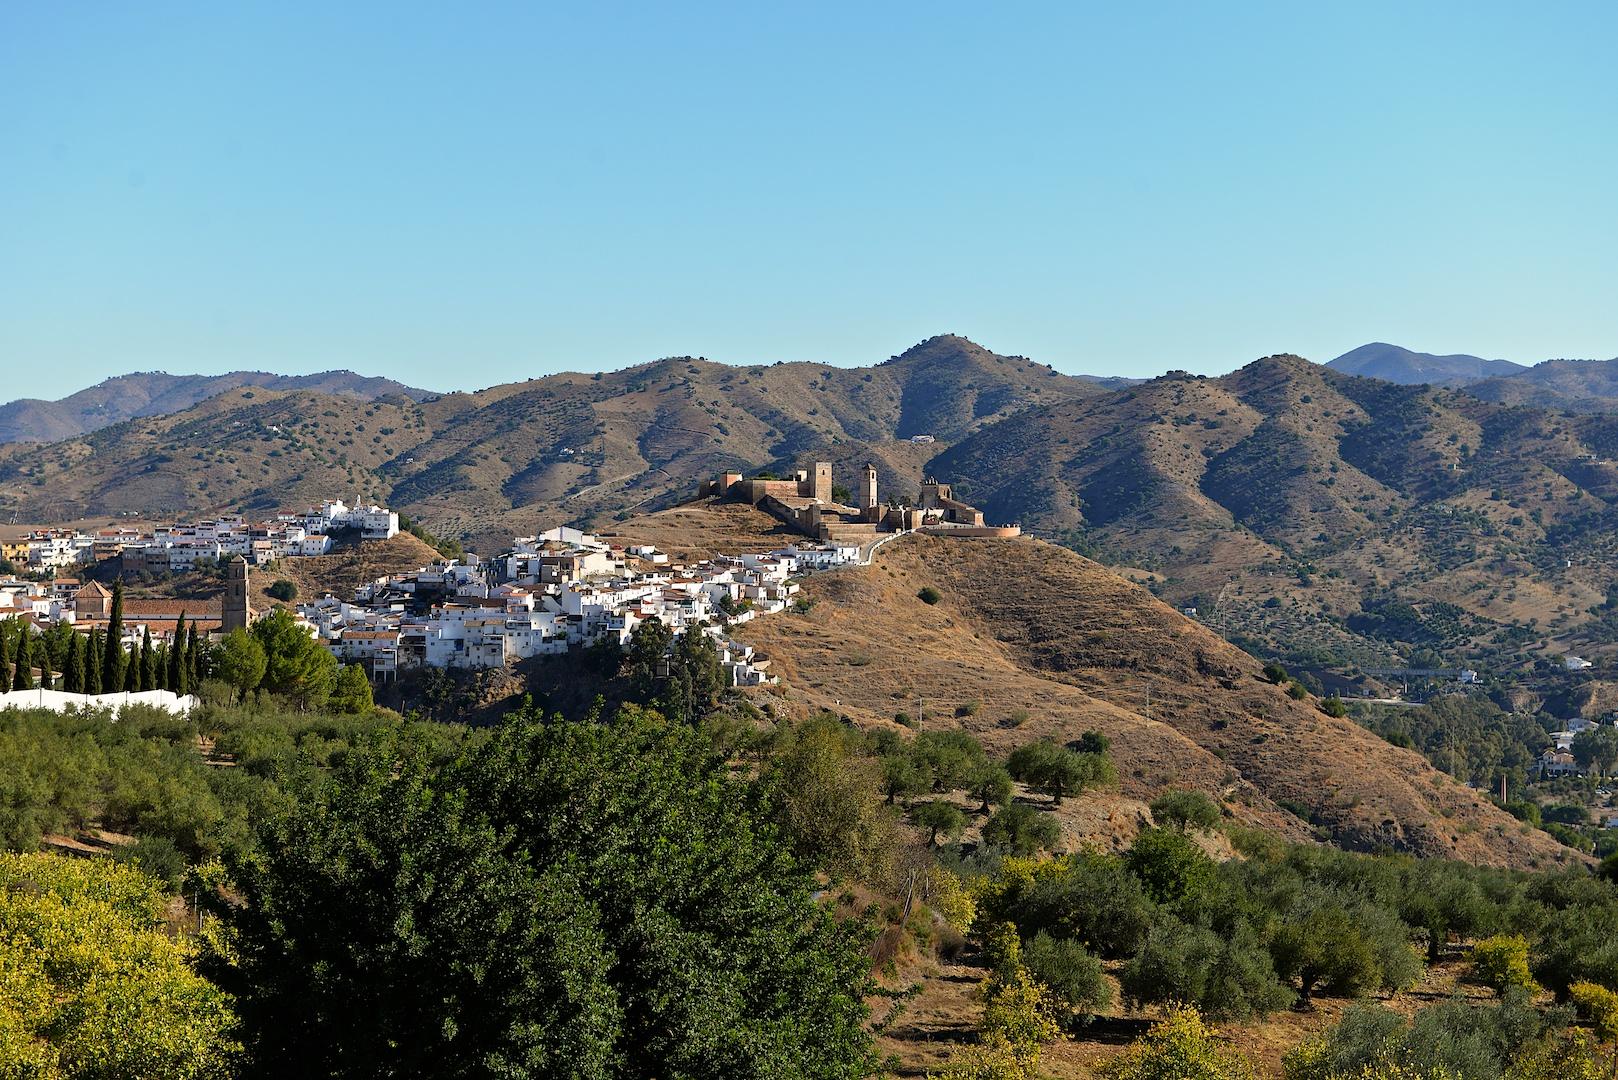 The white village of Alora